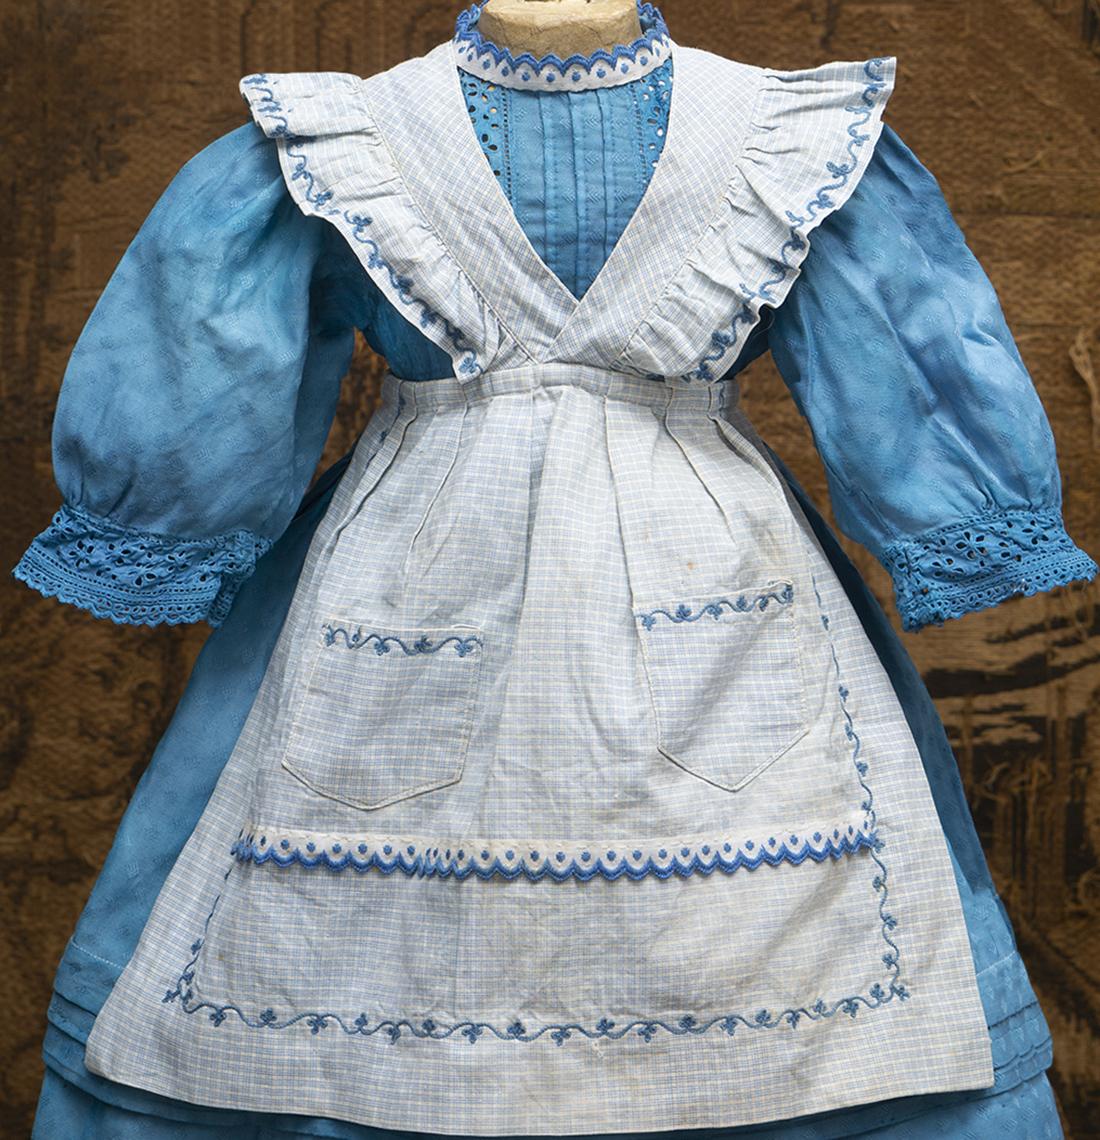 Antique dress and apron